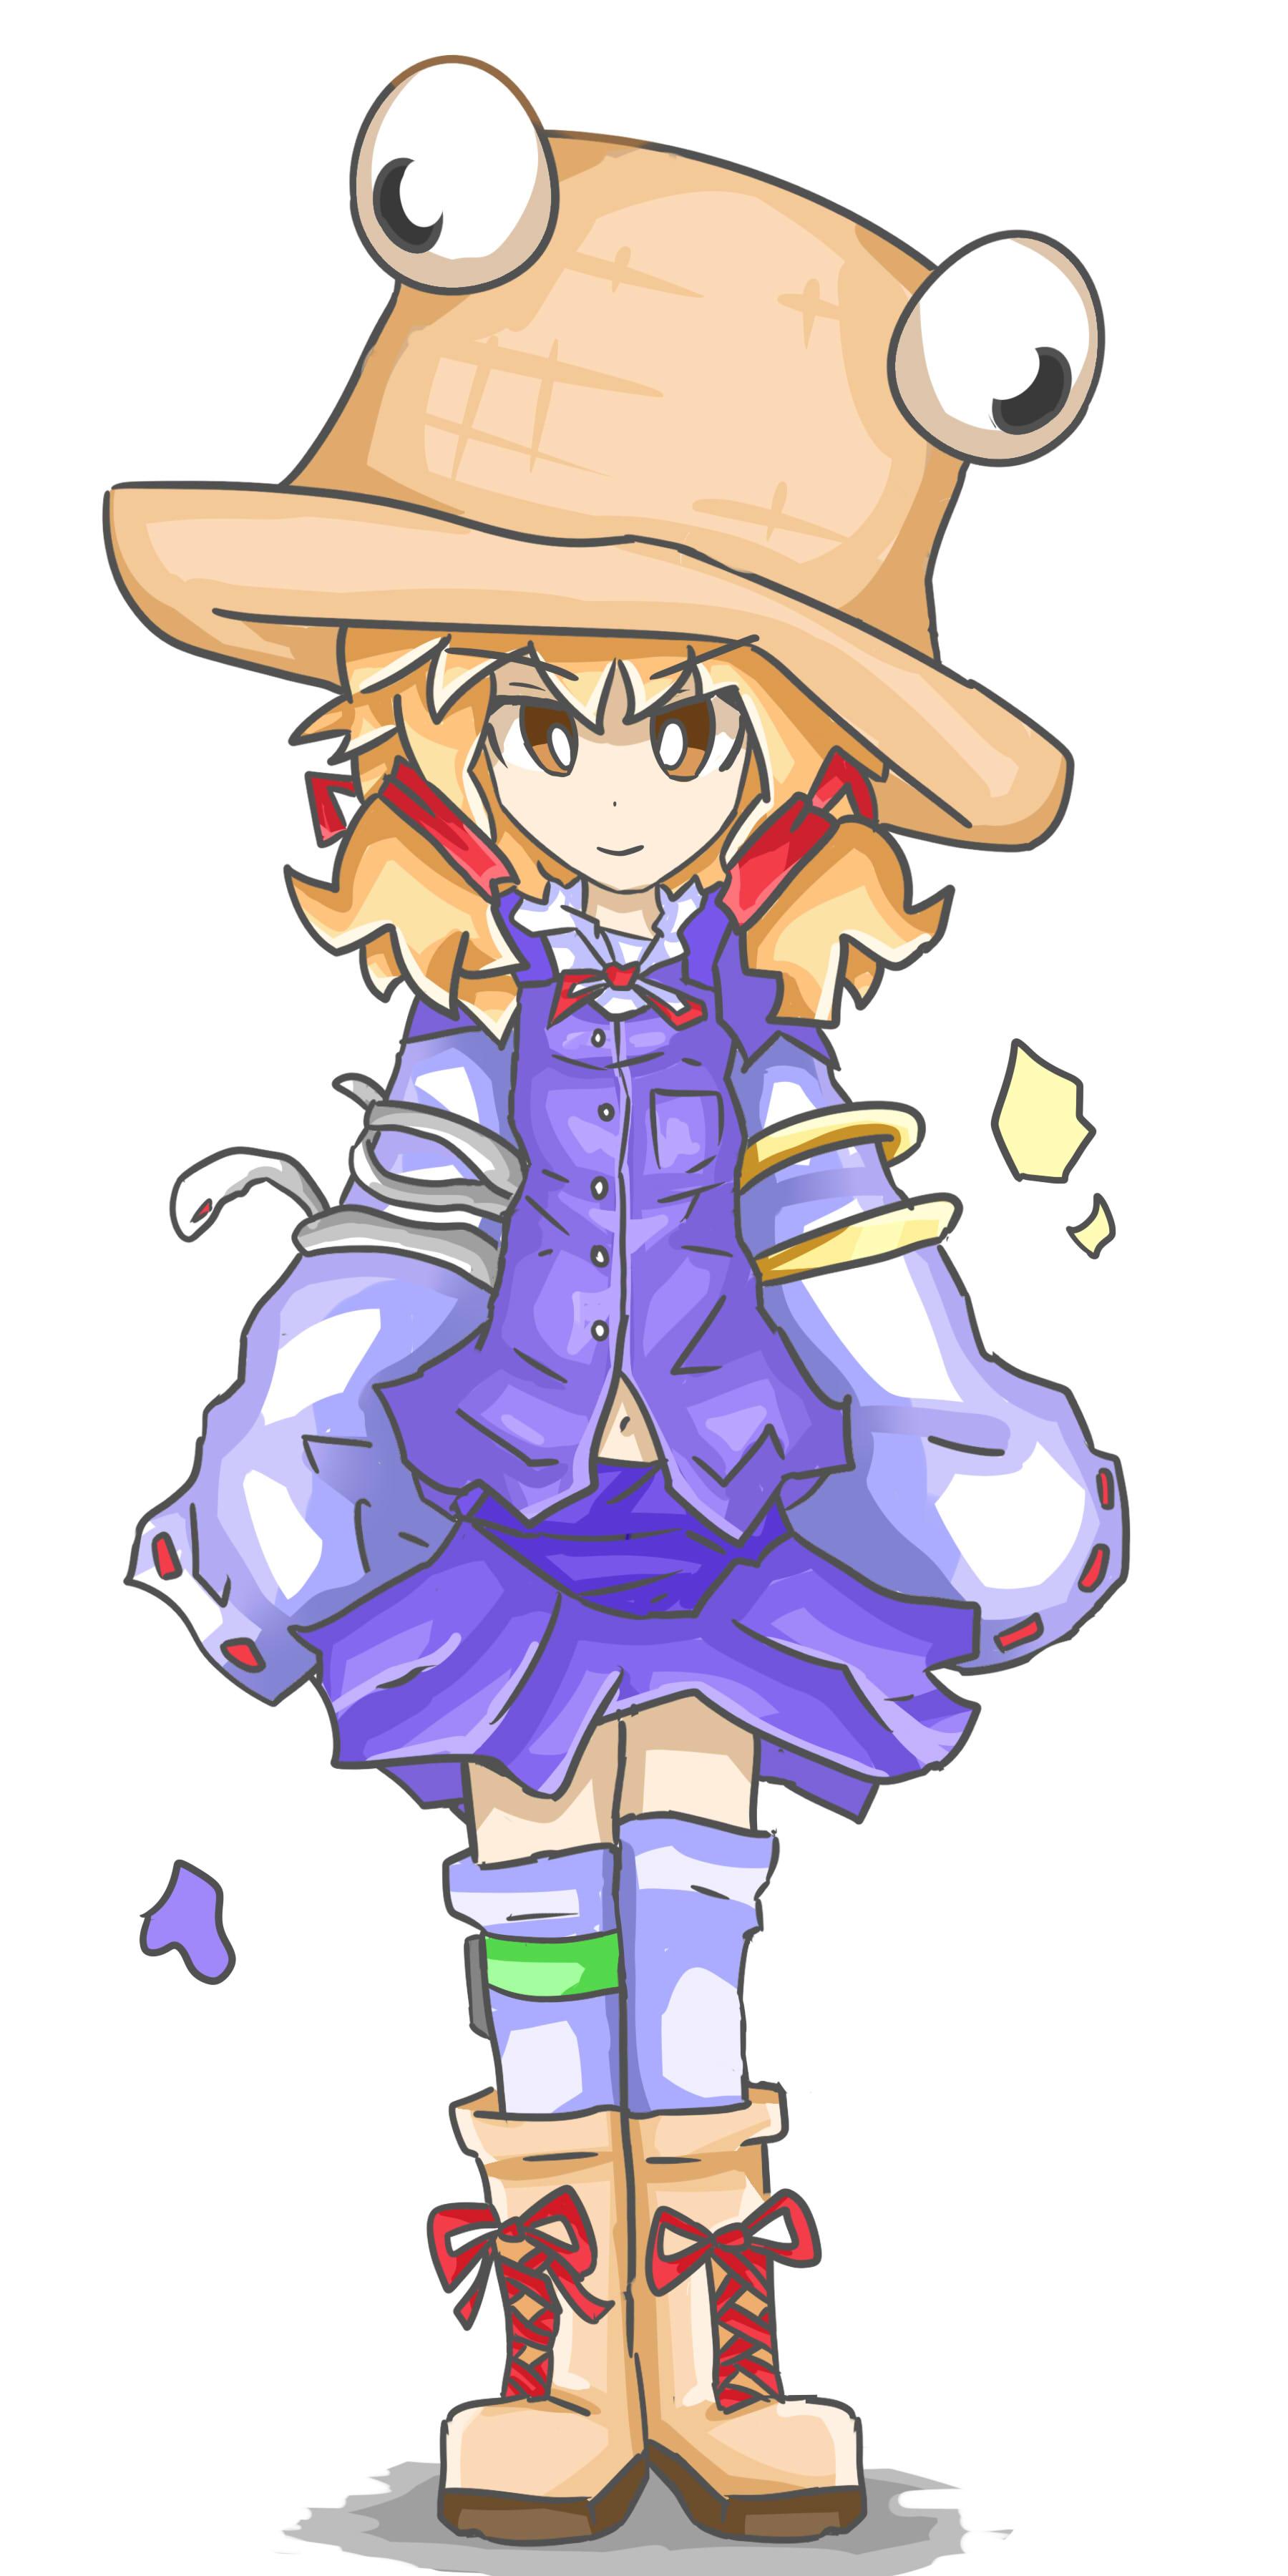 Touhou: Suwako